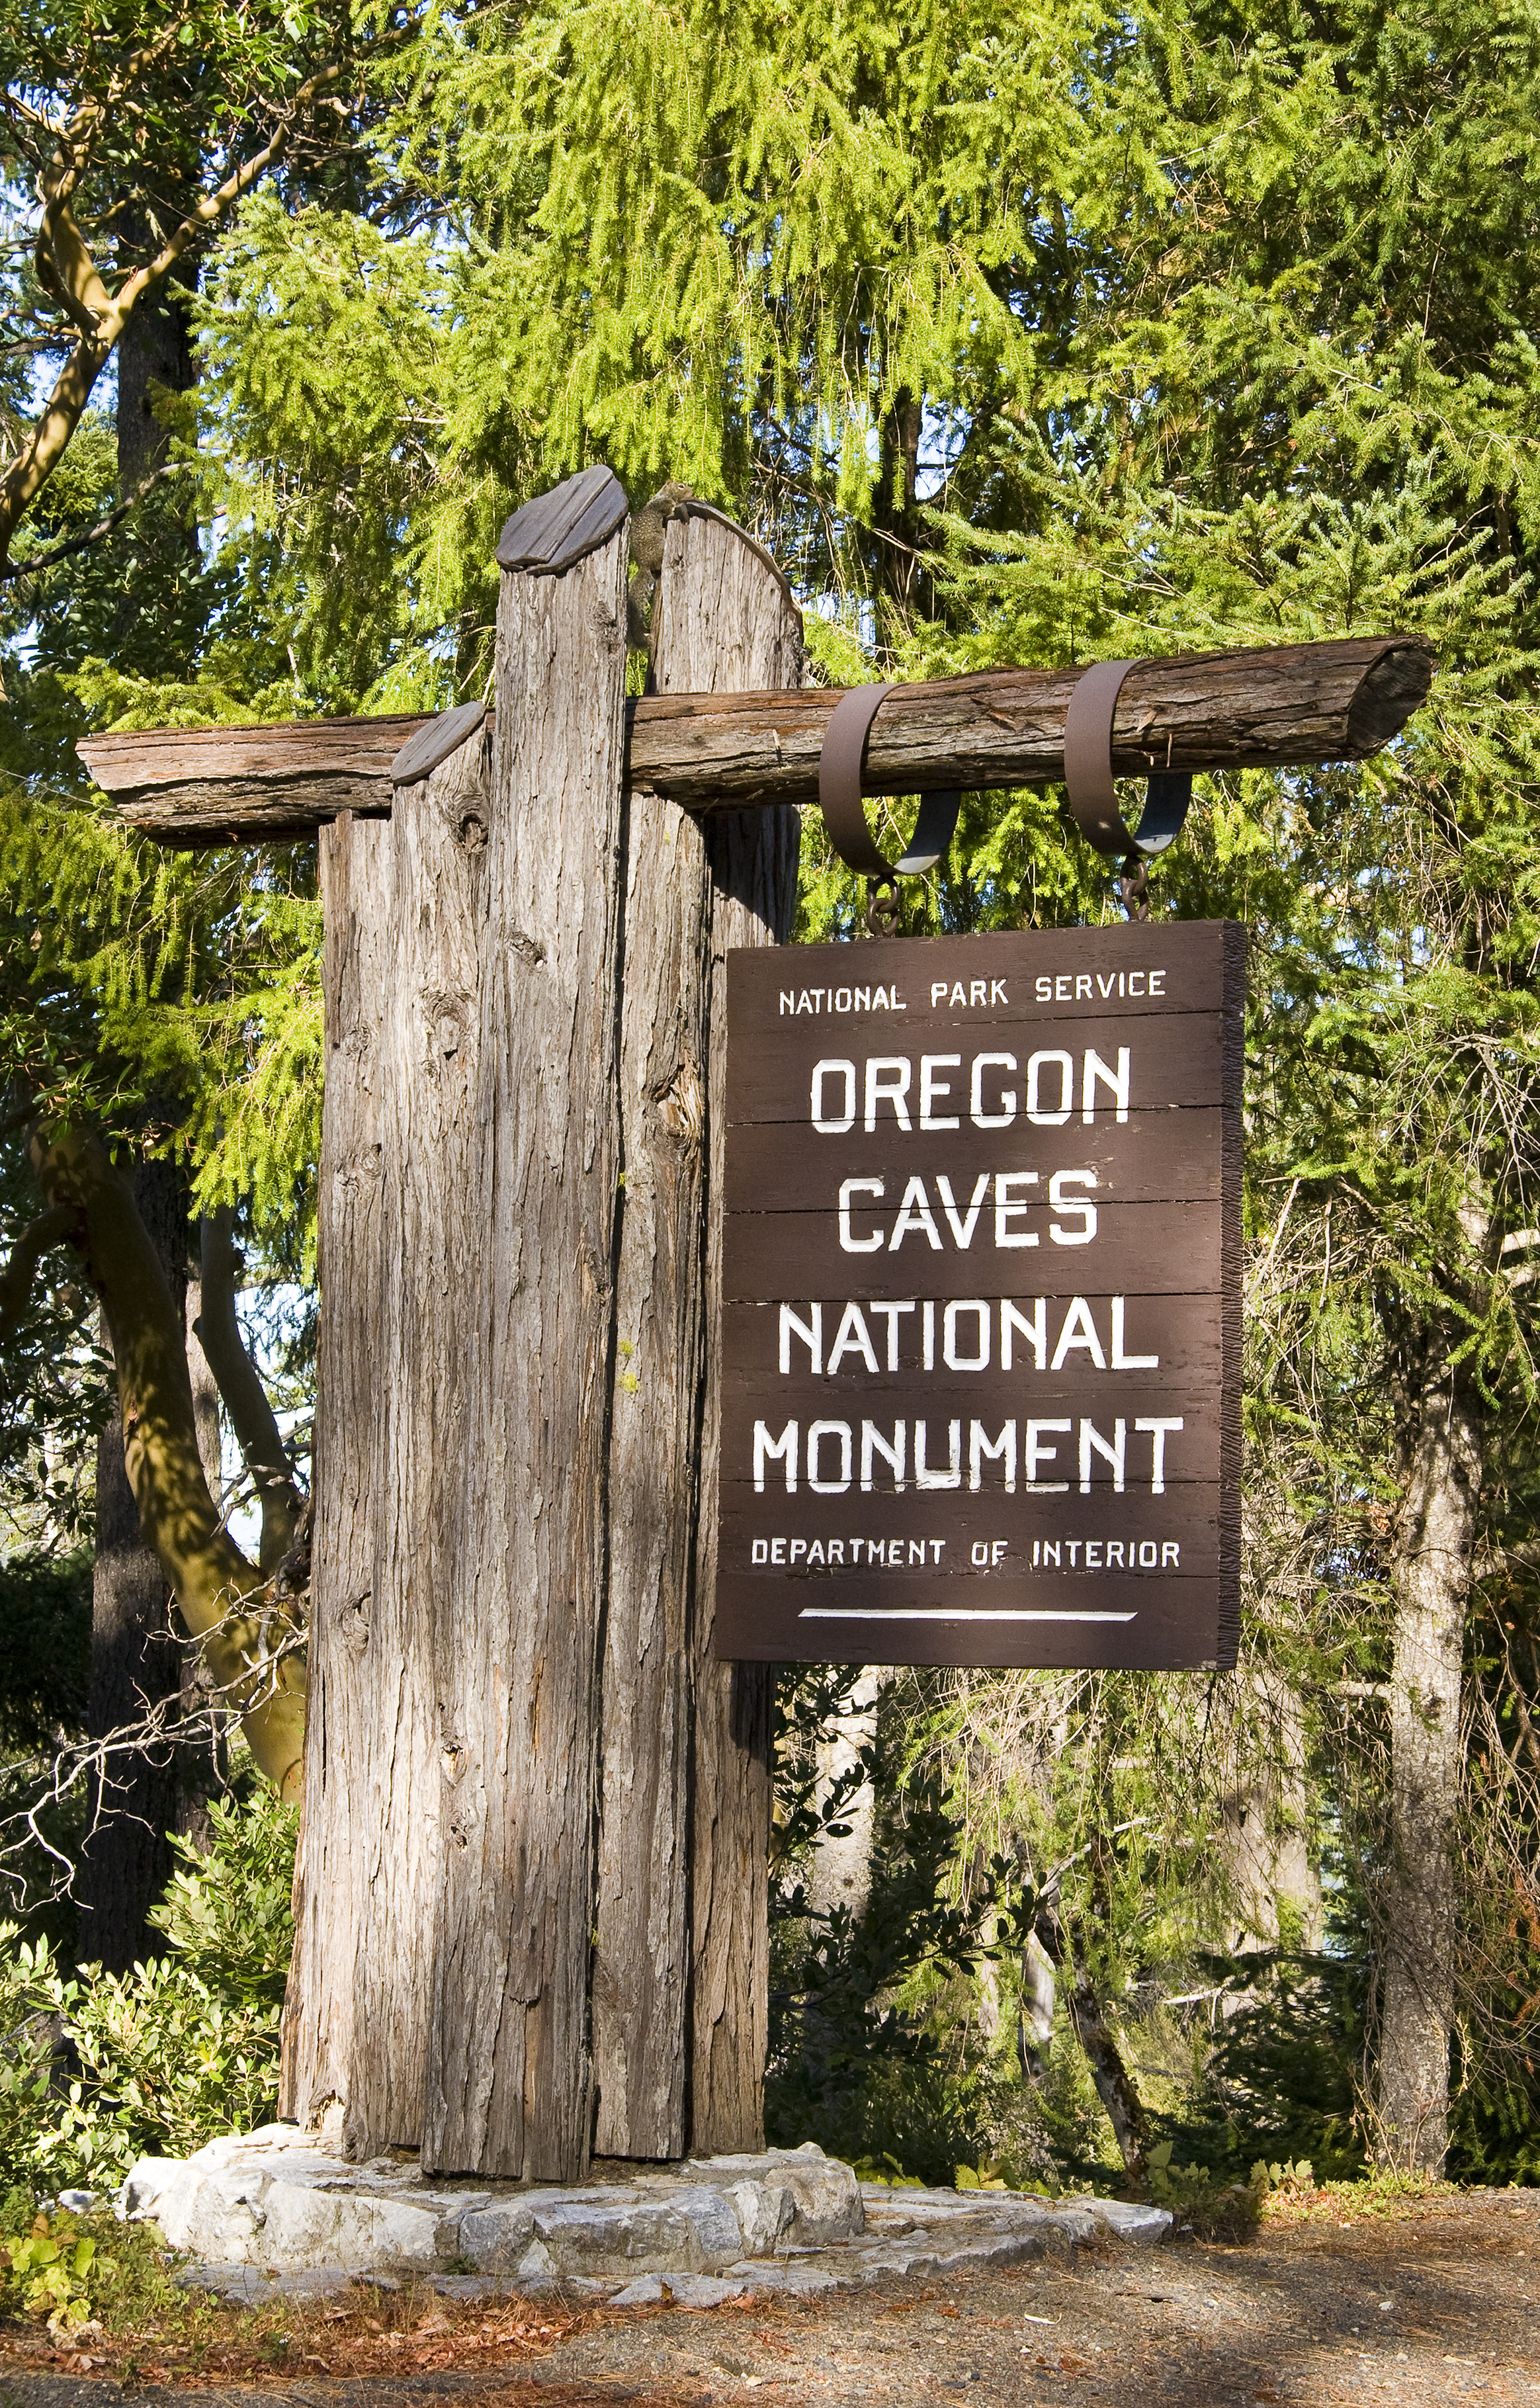 Oregon_Caves_NM_entrance_sign